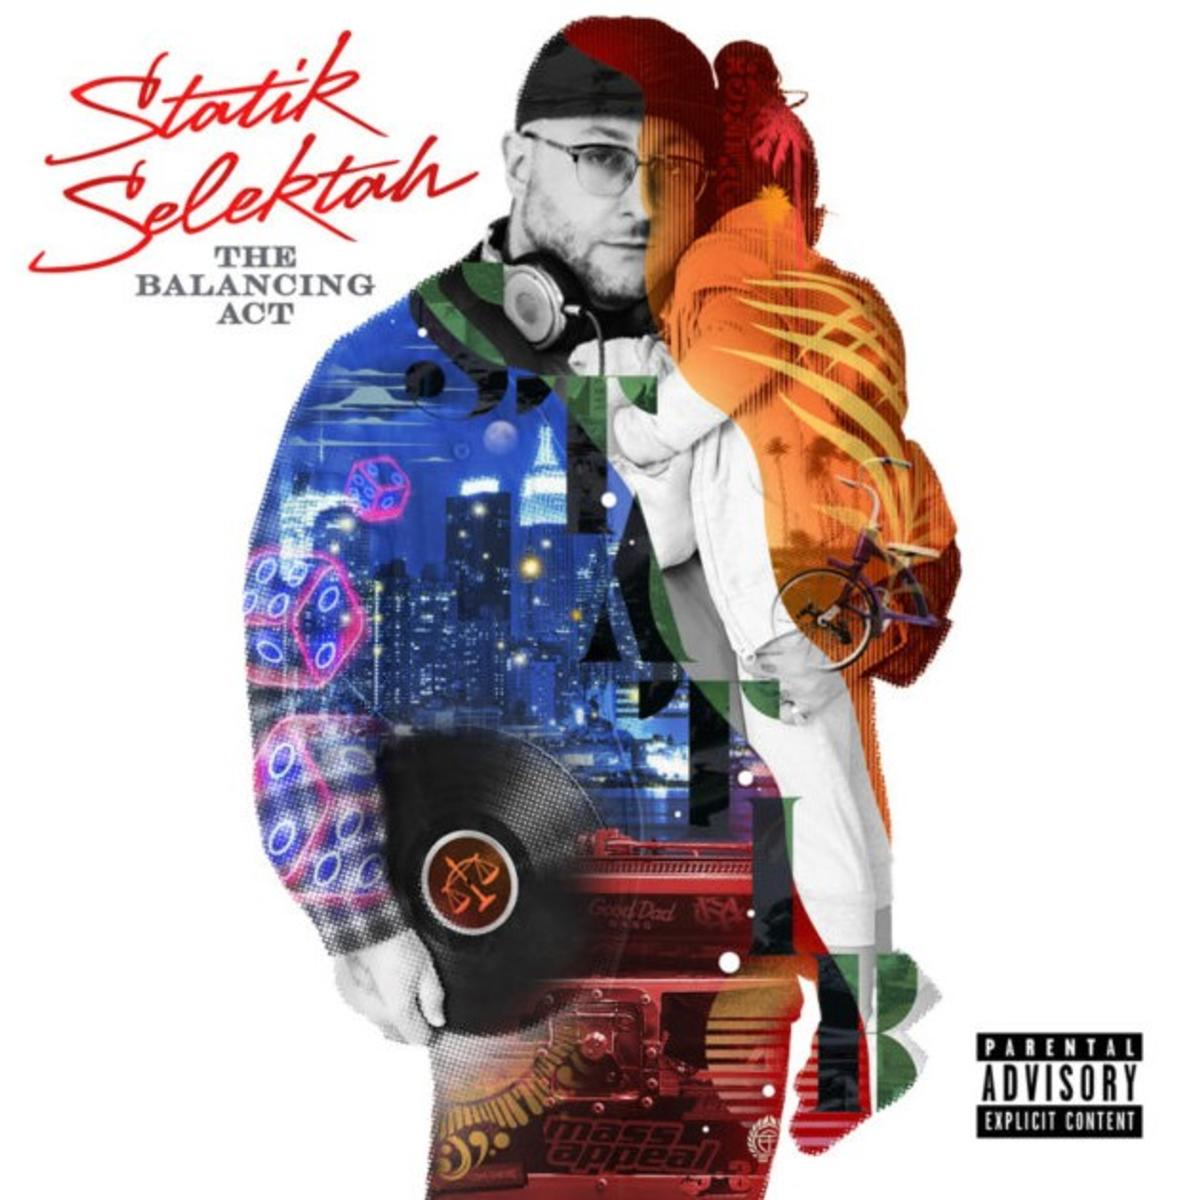 Statik-Selektah-Play-Around.jpg?fit=1200